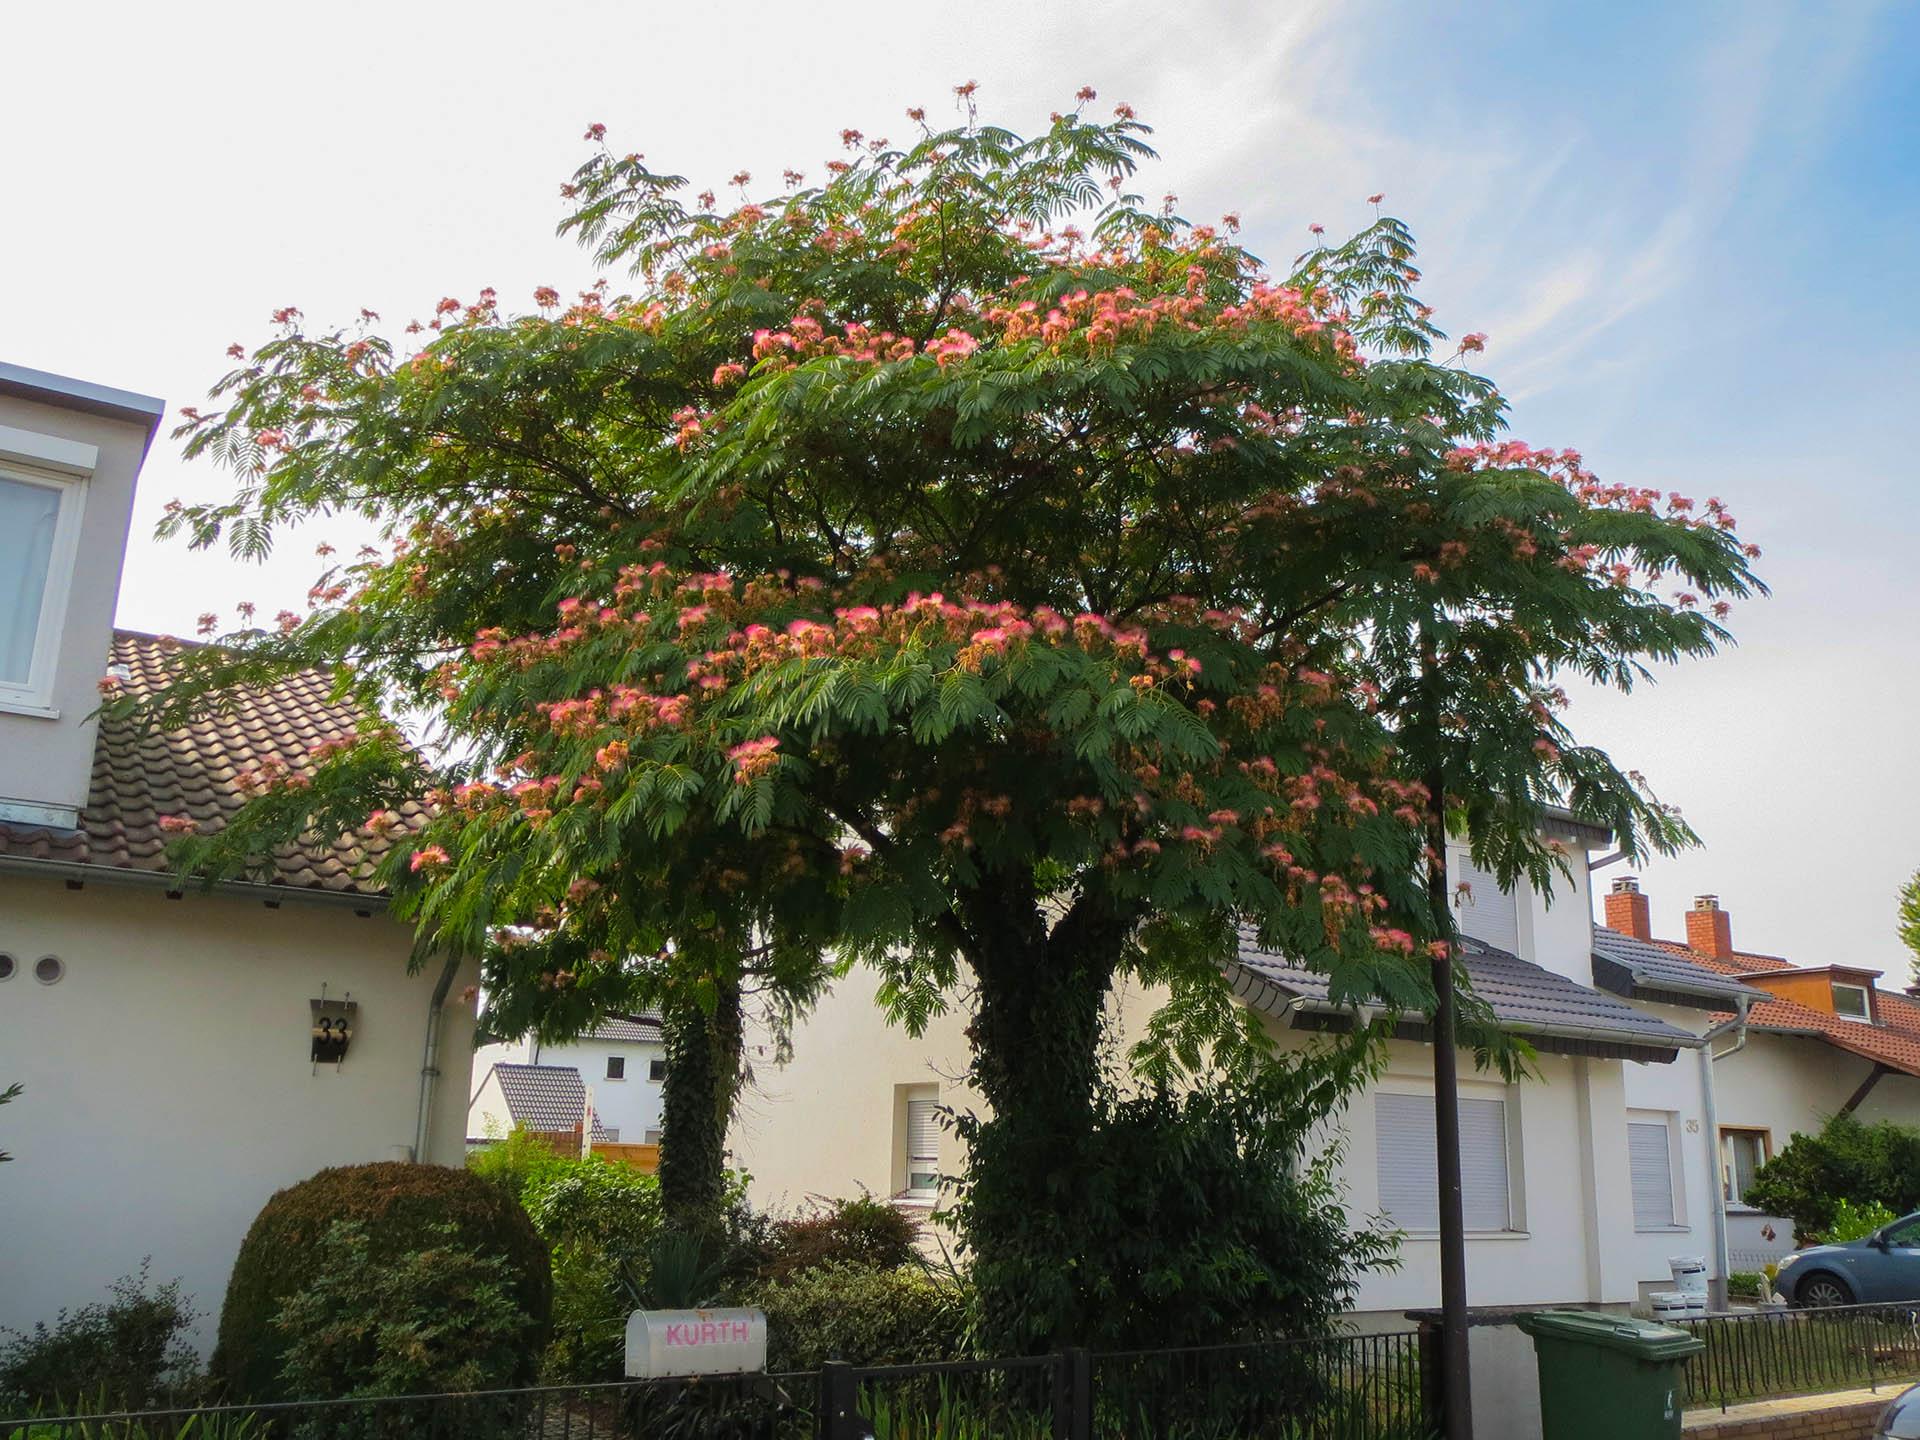 arbore de matase 4-5 metri